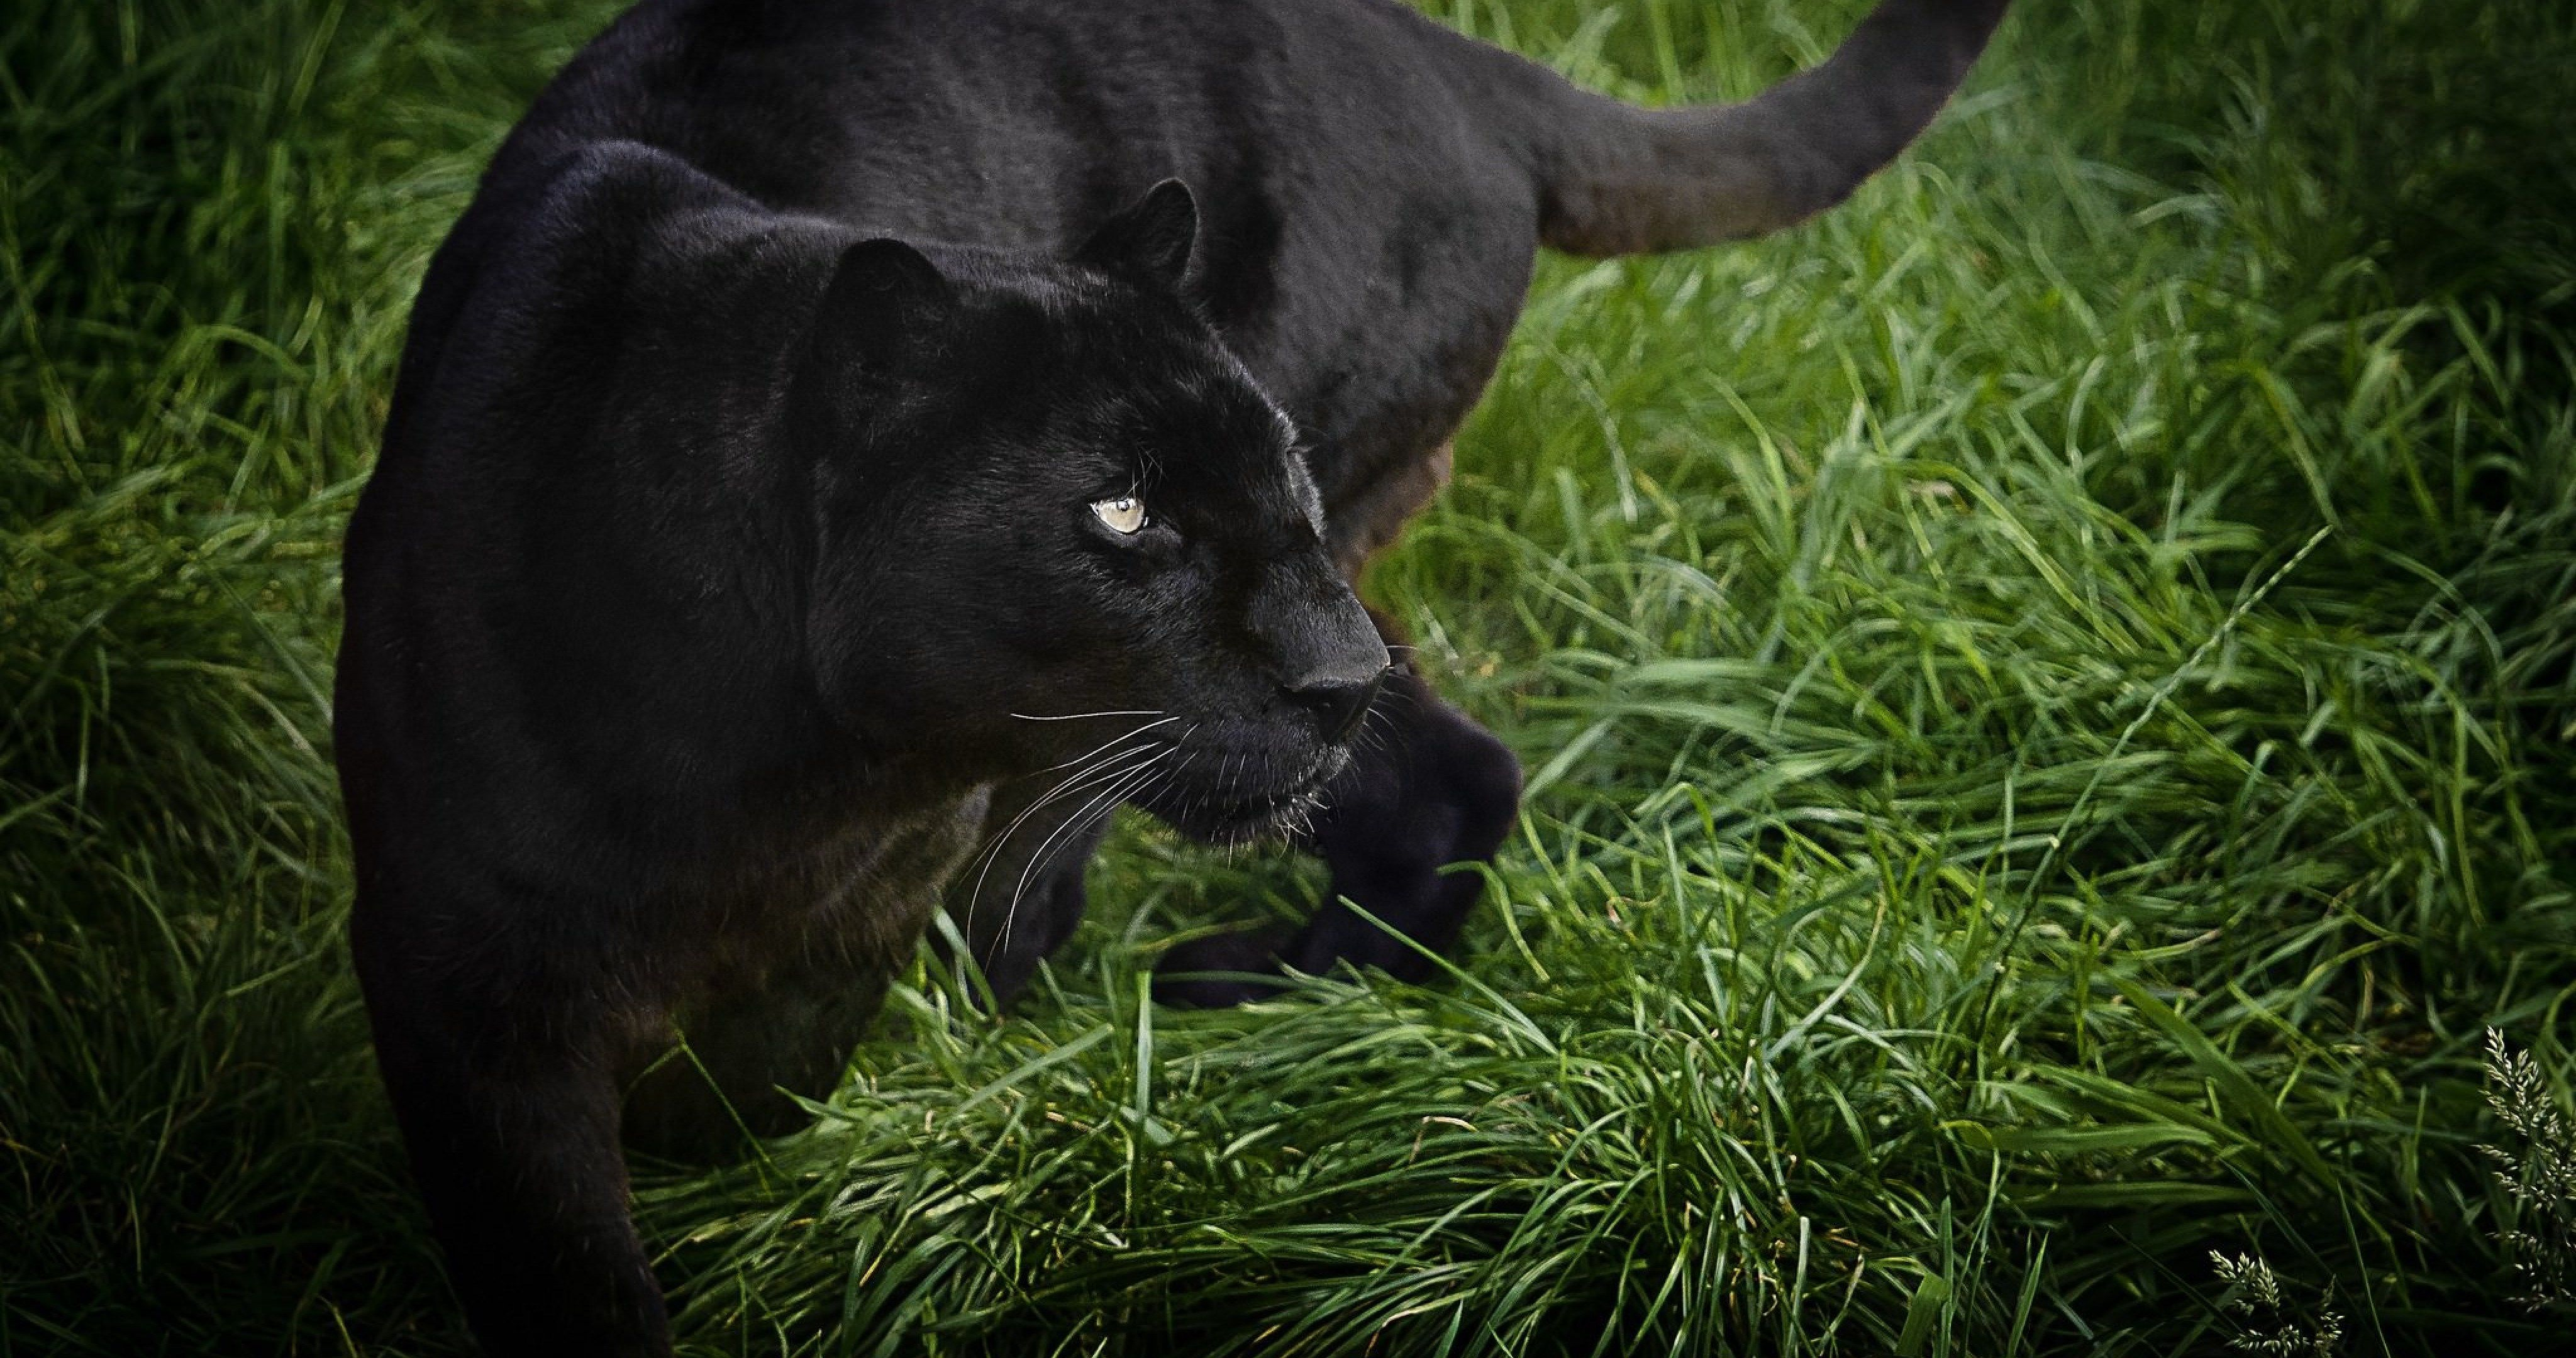 black panther 4k ultra hd wallpaper | Black panther hd ...